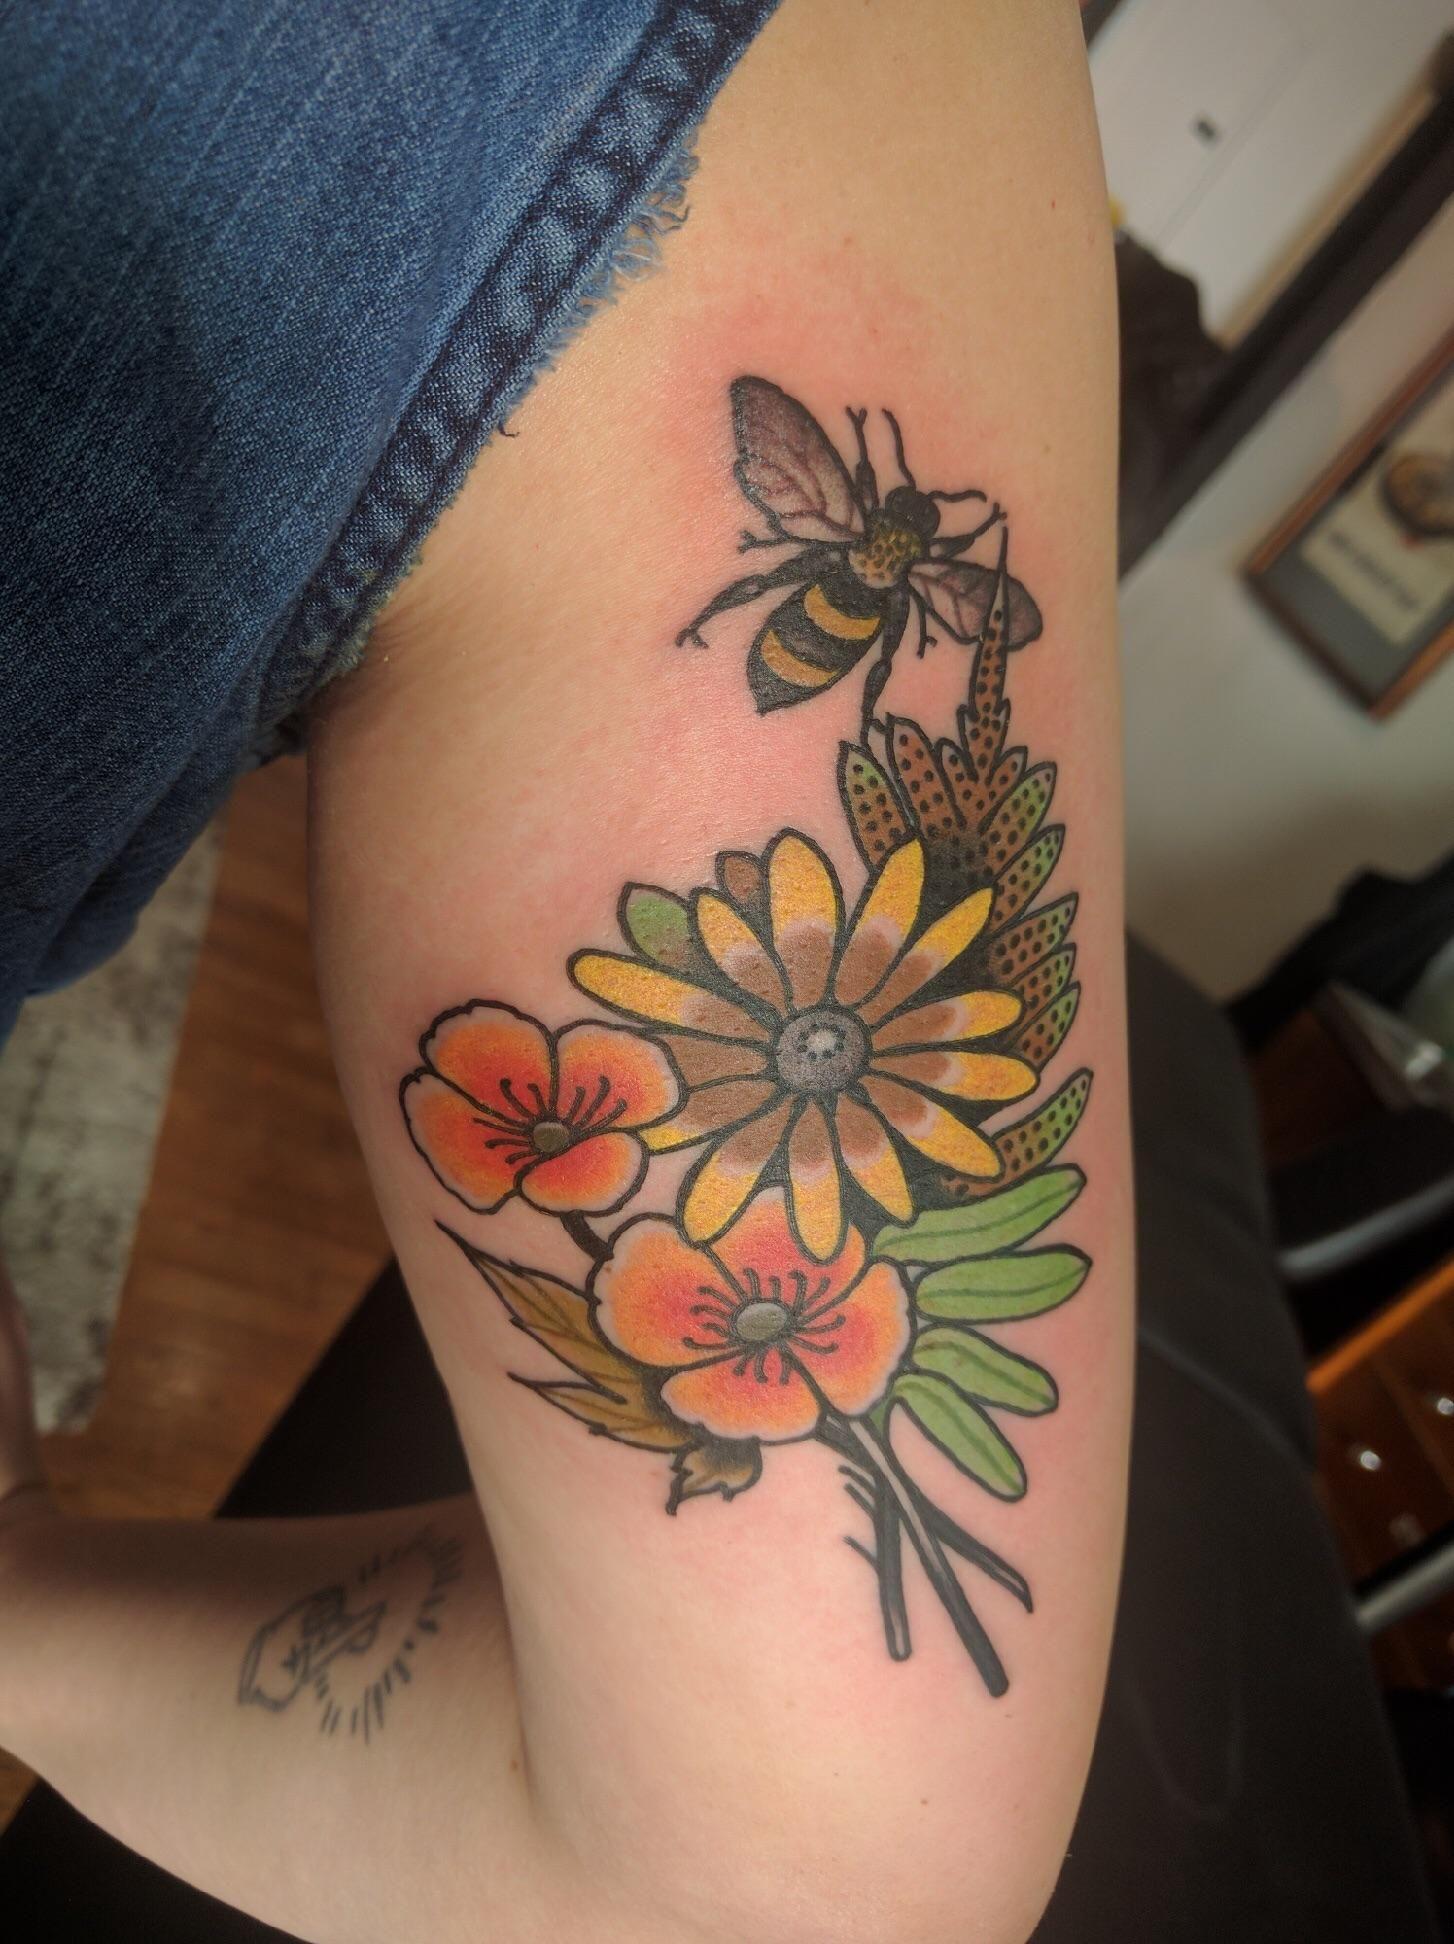 Flowers tattoo amanda leadman at true hand society in